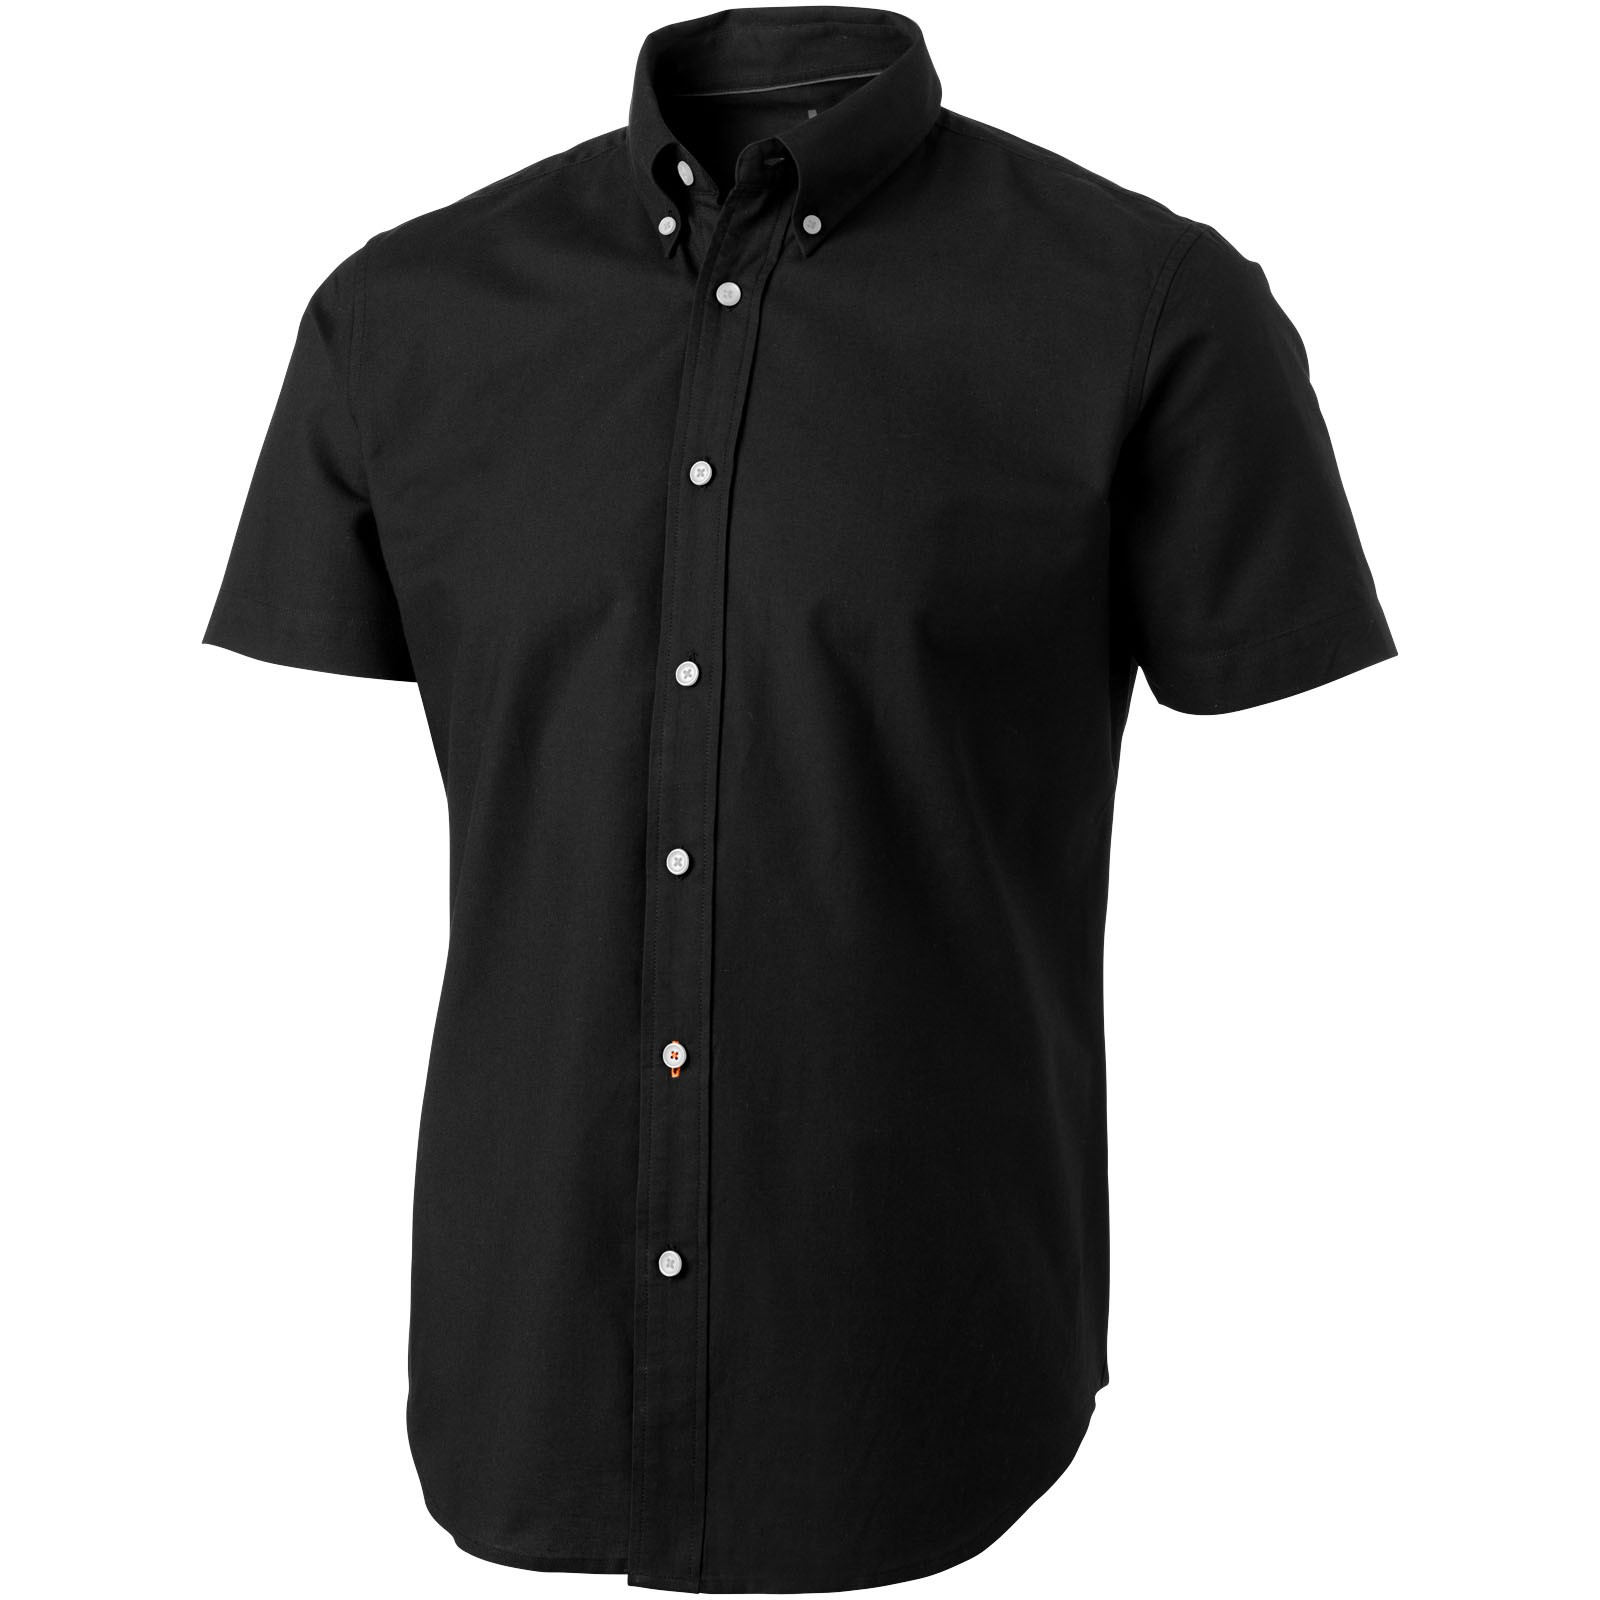 Manitoba short sleeve men's oxford shirt - Solid black / XL